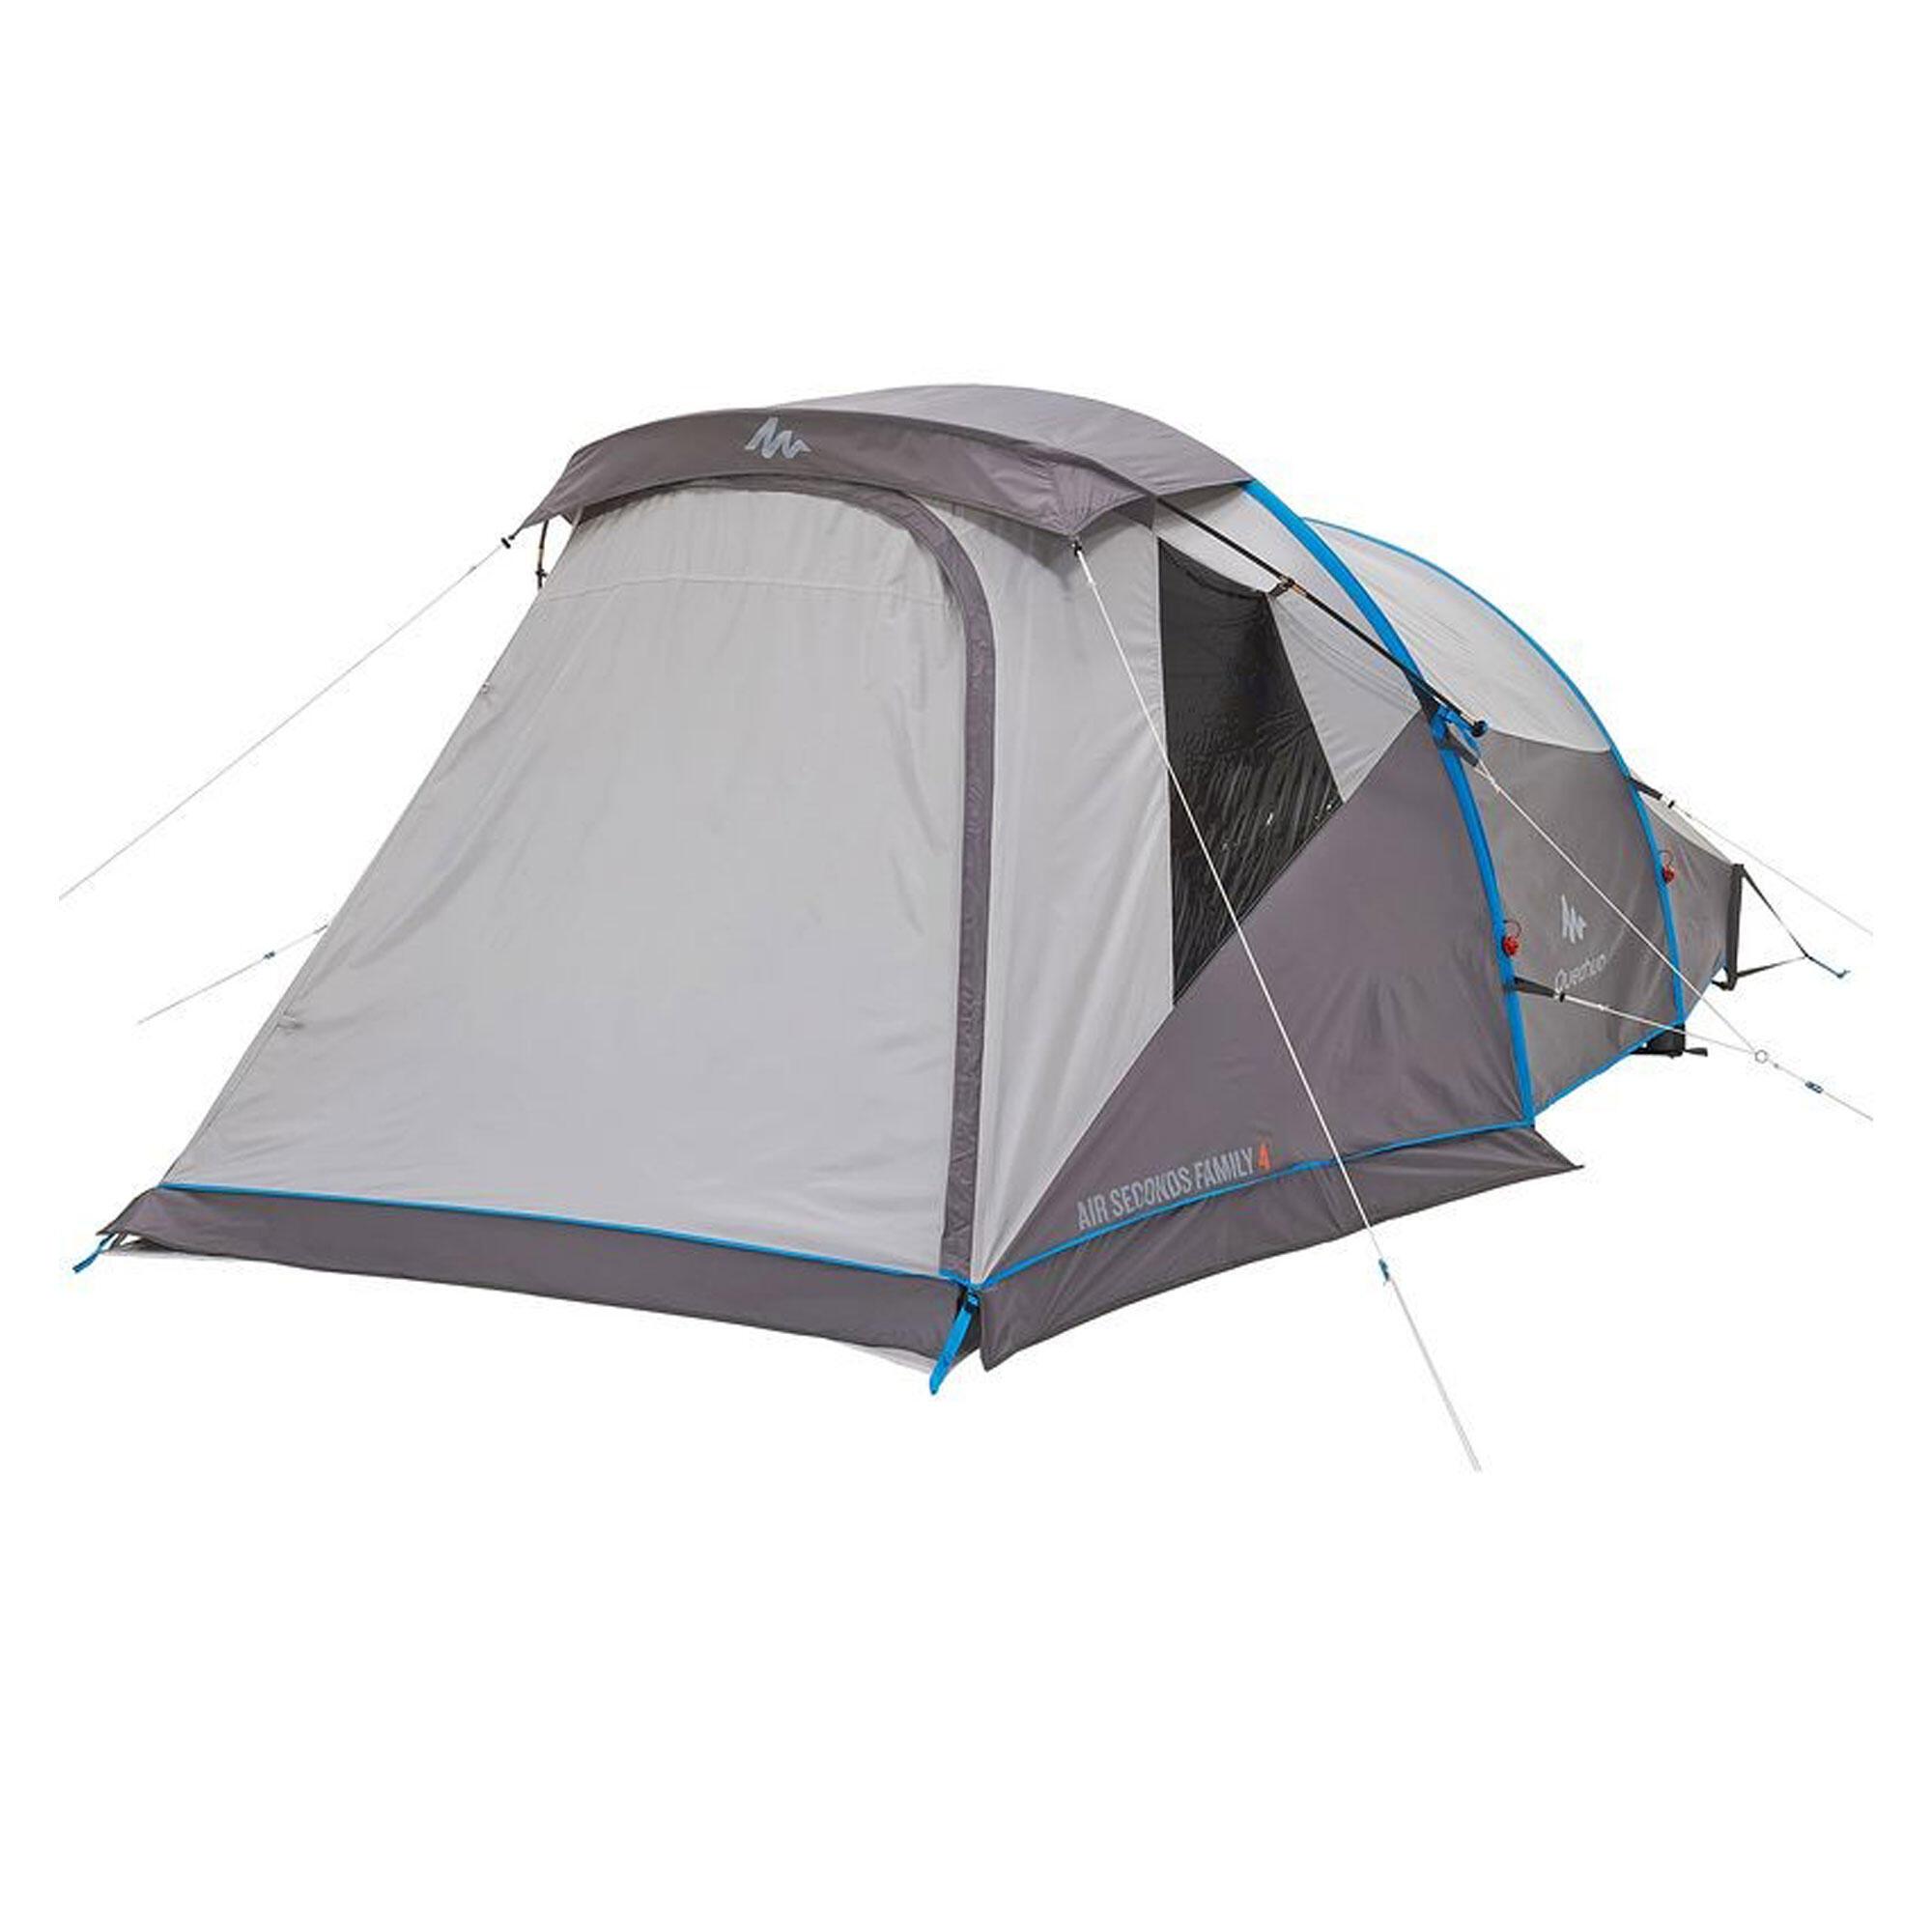 quechua doppio tetto per tenda air-seconds family 4